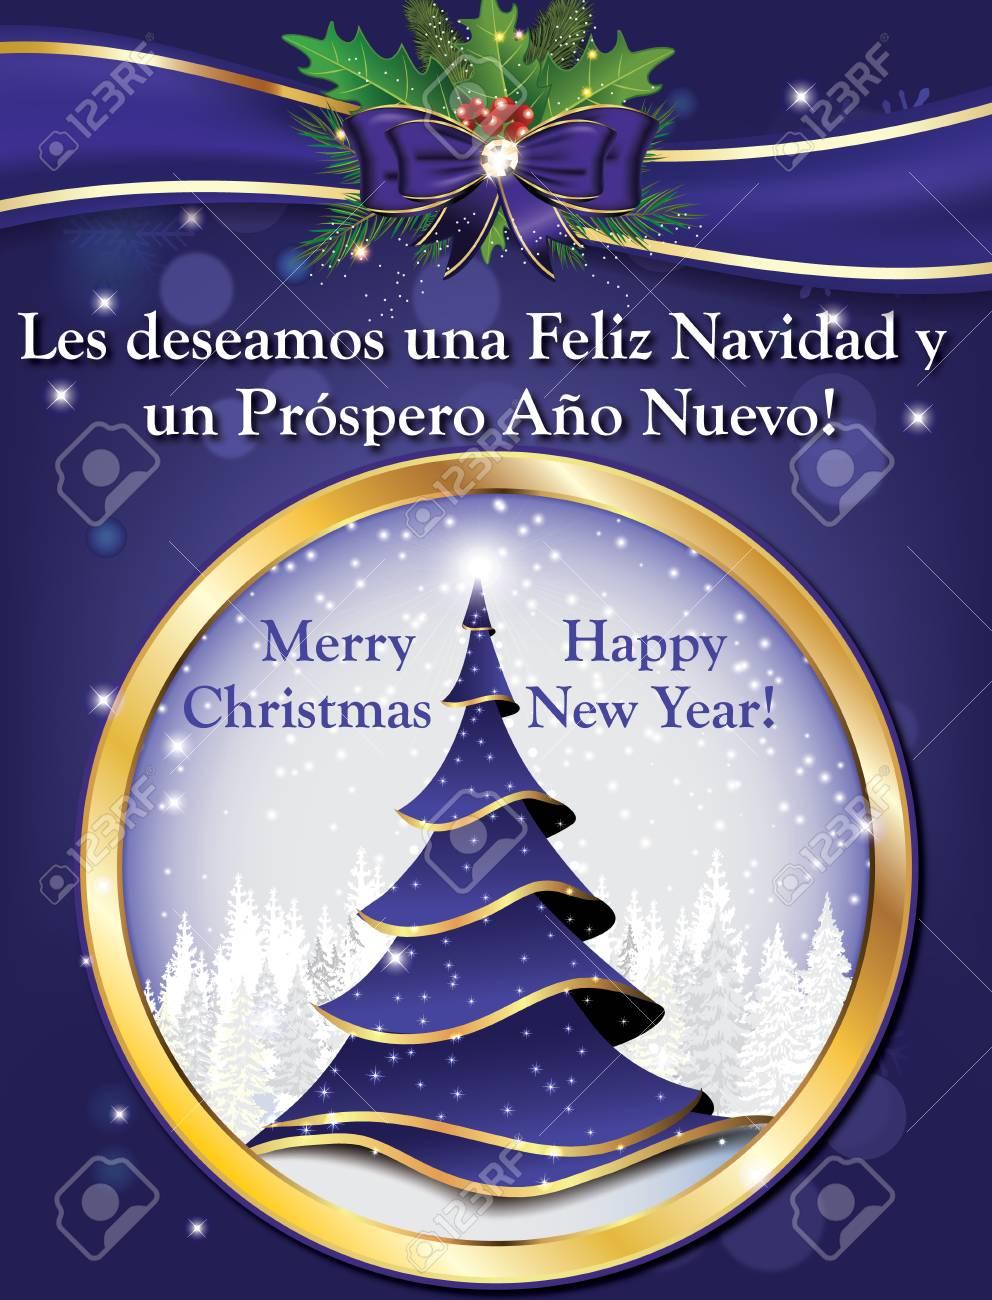 Auguri Di Buon Natale We Wish You A Merry Christmas.Spanish Greeting Card For Winter Holiday Les Deseamos Feliz